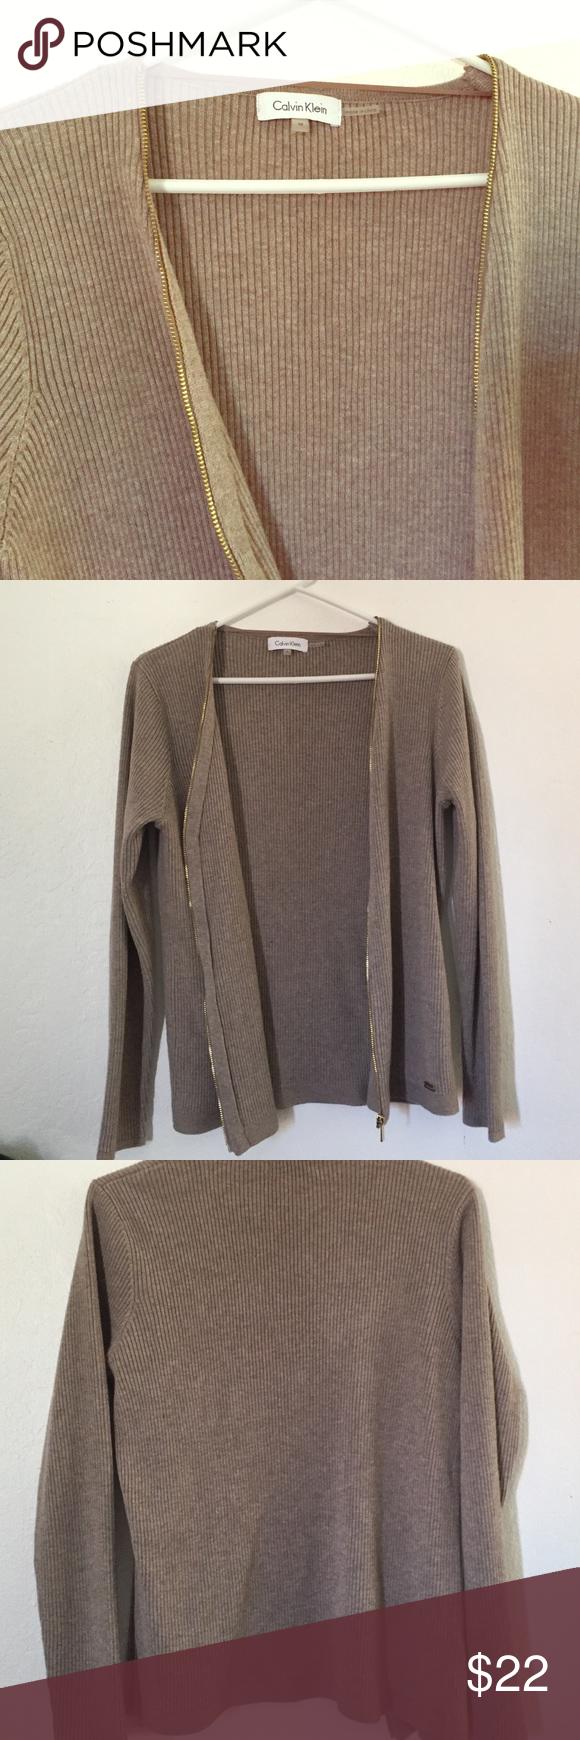 Calvin Klein zippered cardigan worn a few times still in good condition Calvin Klein Sweaters Cardigans